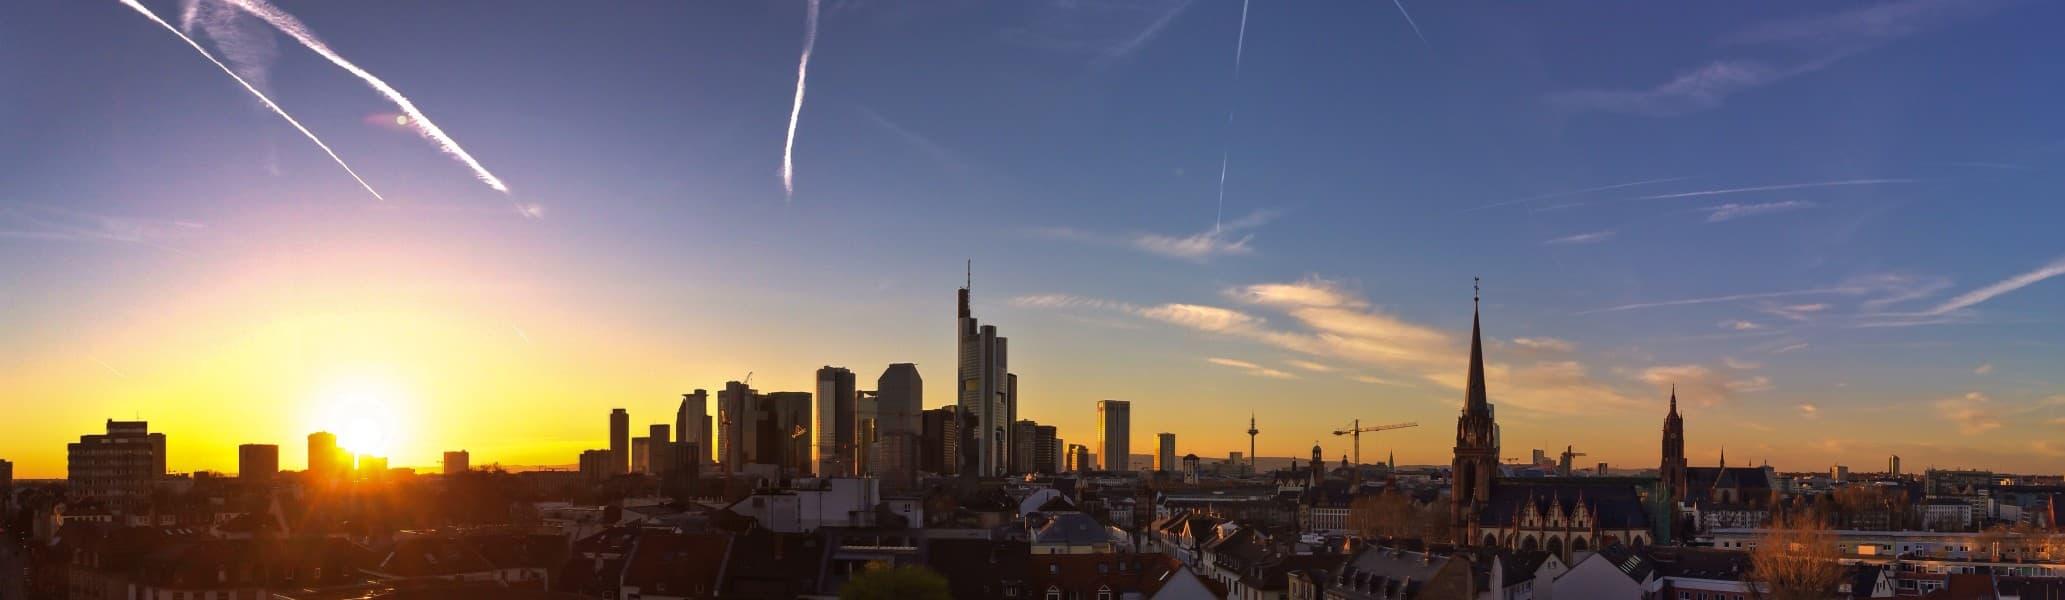 Wettbewerbsrecht Anwälte Kanzlei WeSaveYourCopyrights Rechtsanwaltsgesellschaft mbH Frankfurt am Main Skyline